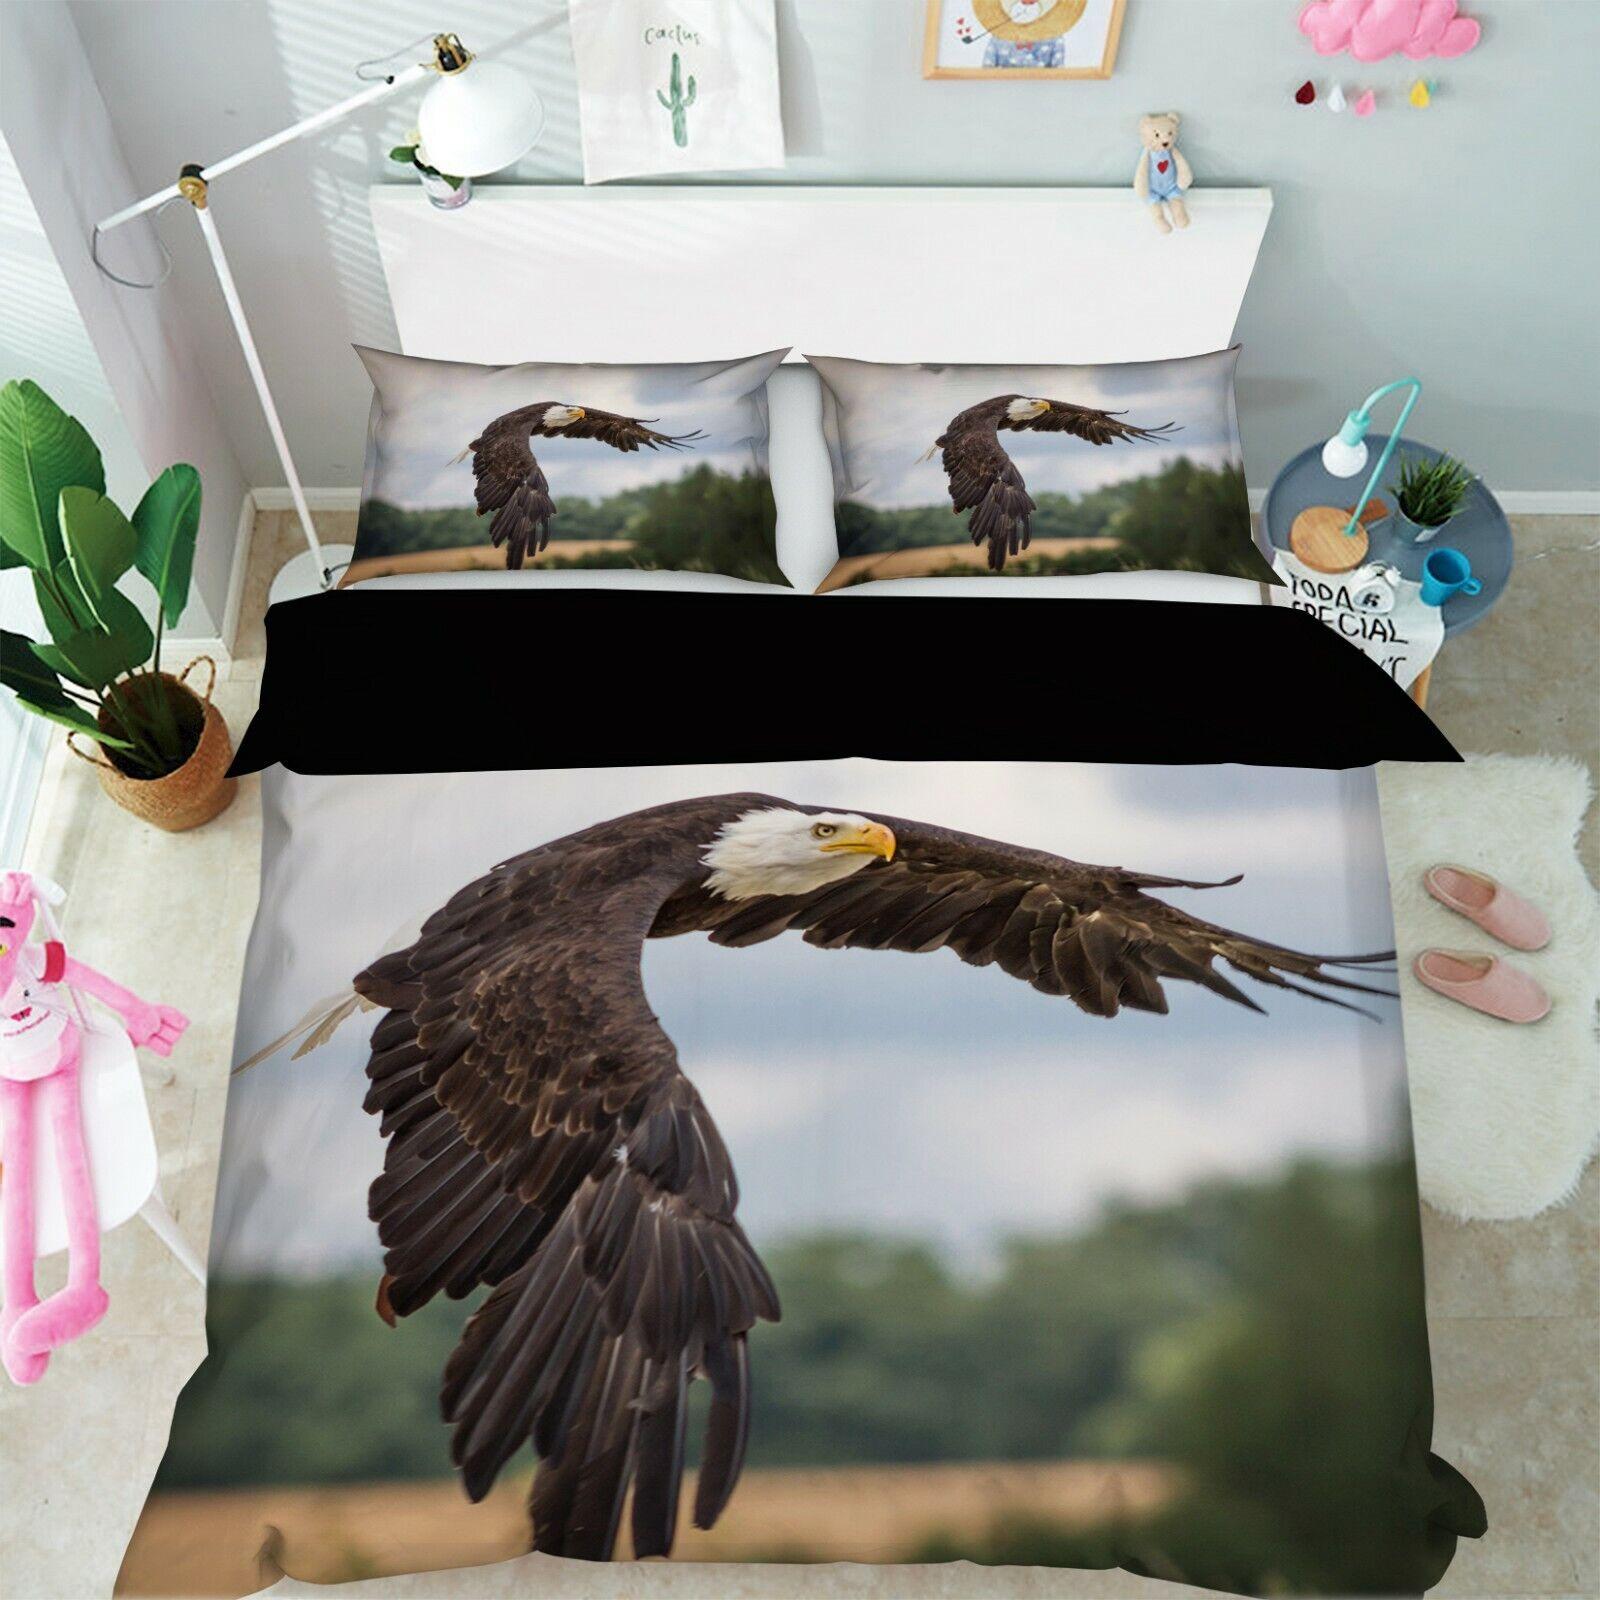 3D Eagle Flying Sky I25 Animal Bett Pillowcases Quilt Duvet Startseite Königin König An